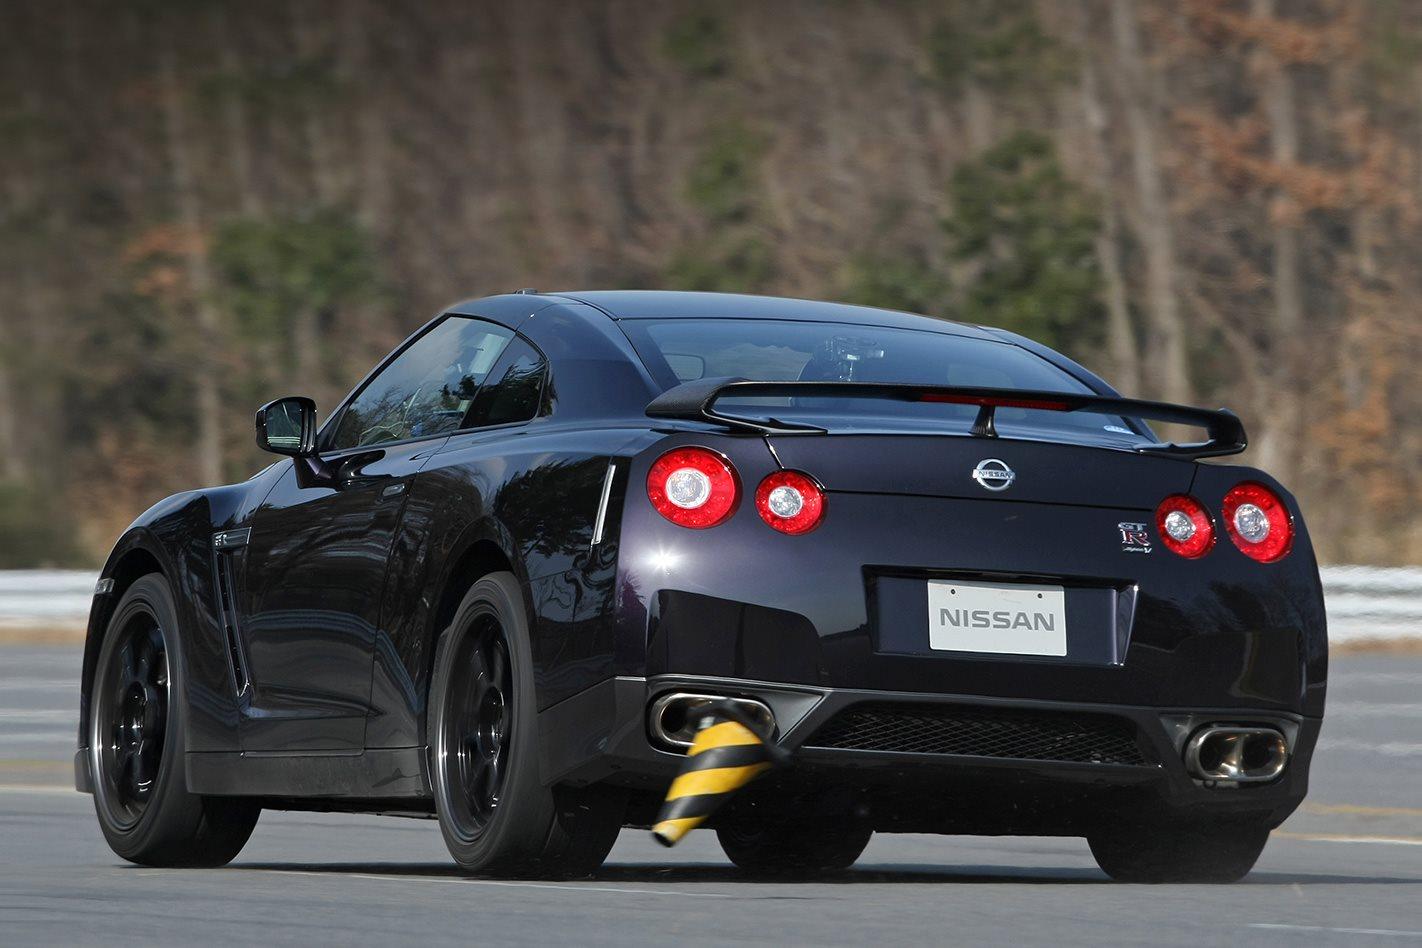 Nissan R35 GT-R Spec-V testing